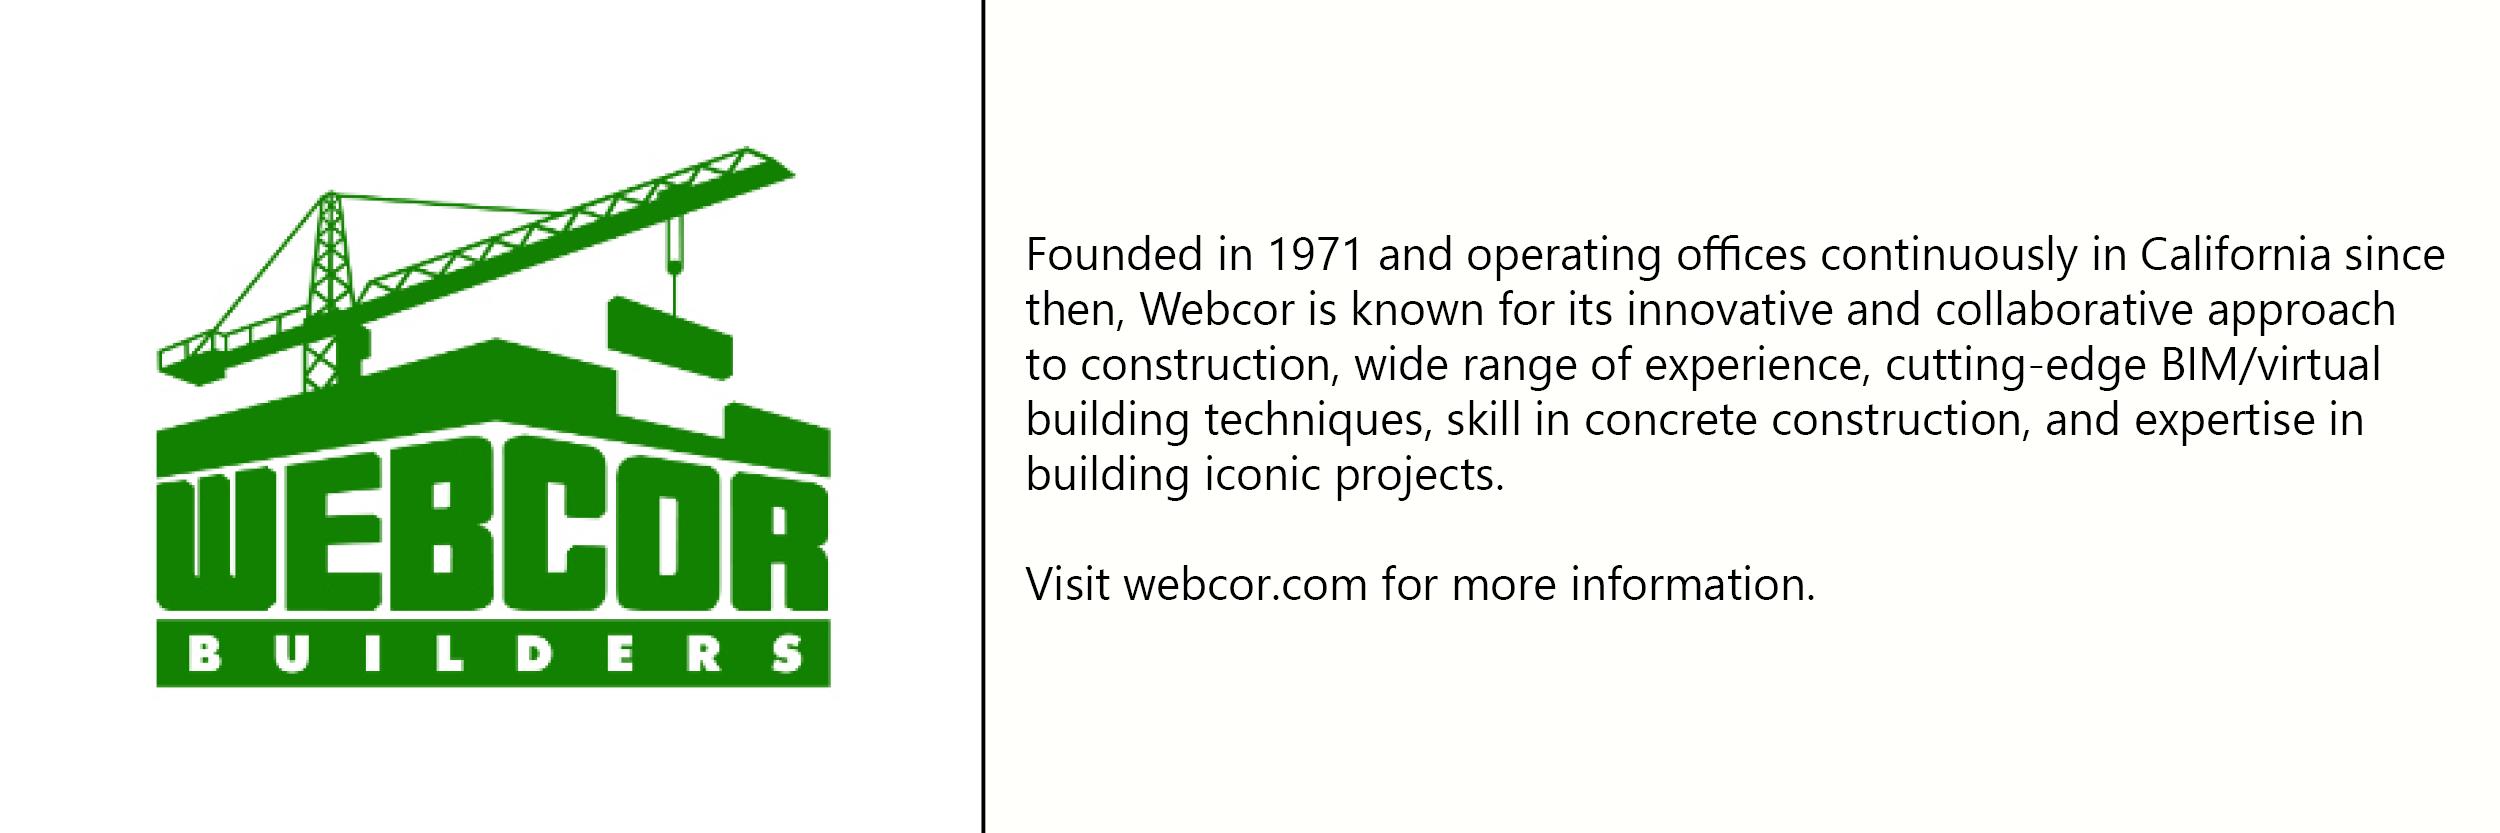 Webcor  logo with description of company